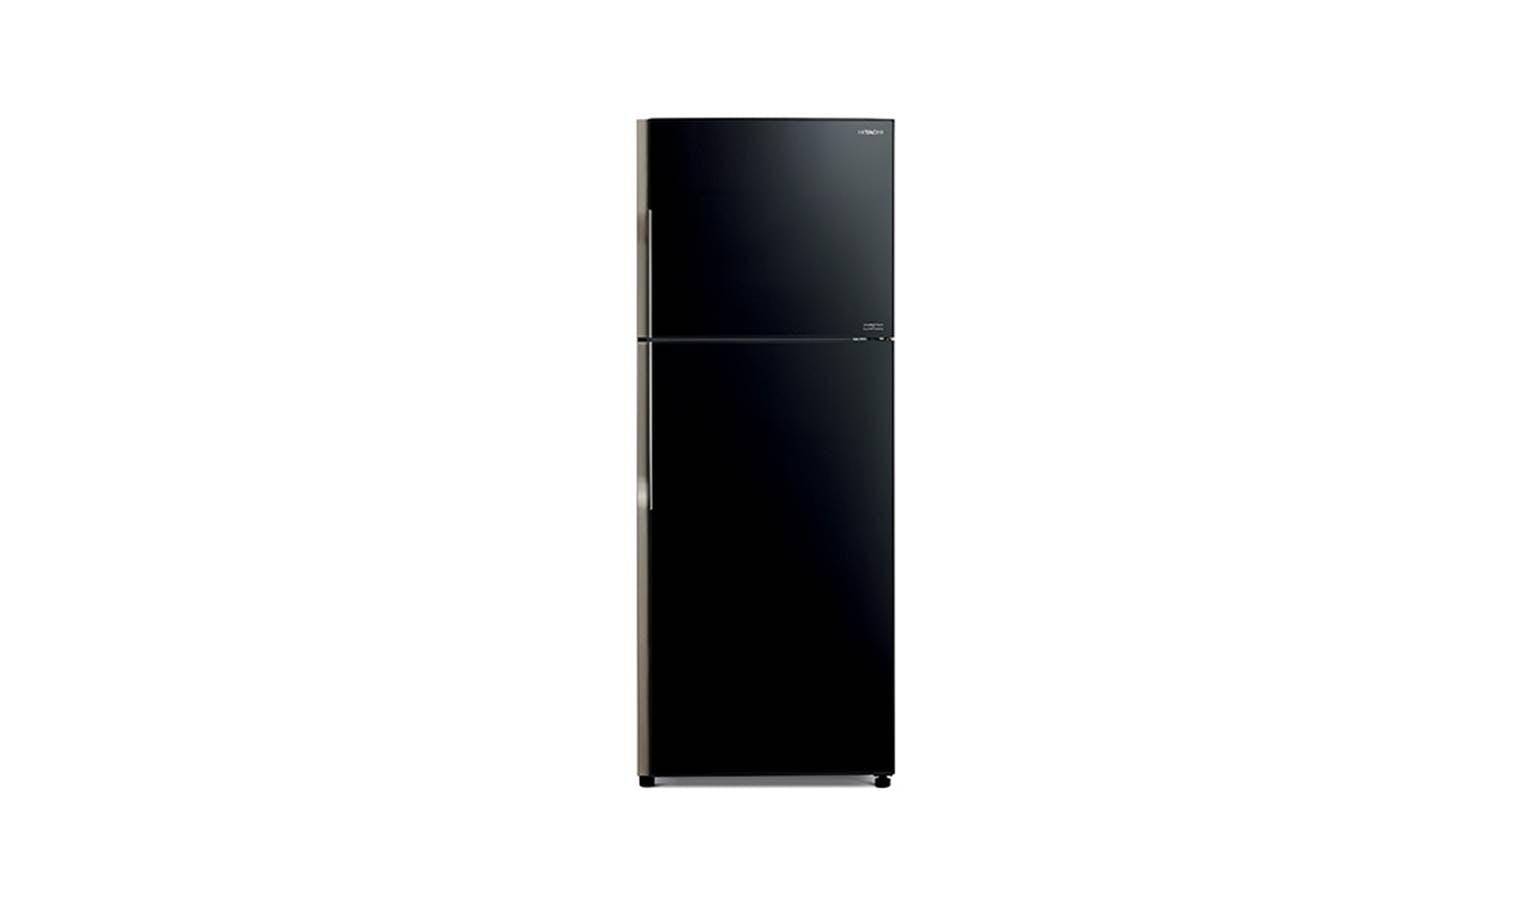 Hitachi 451 L 2-Door Refrigerator - Glass Black